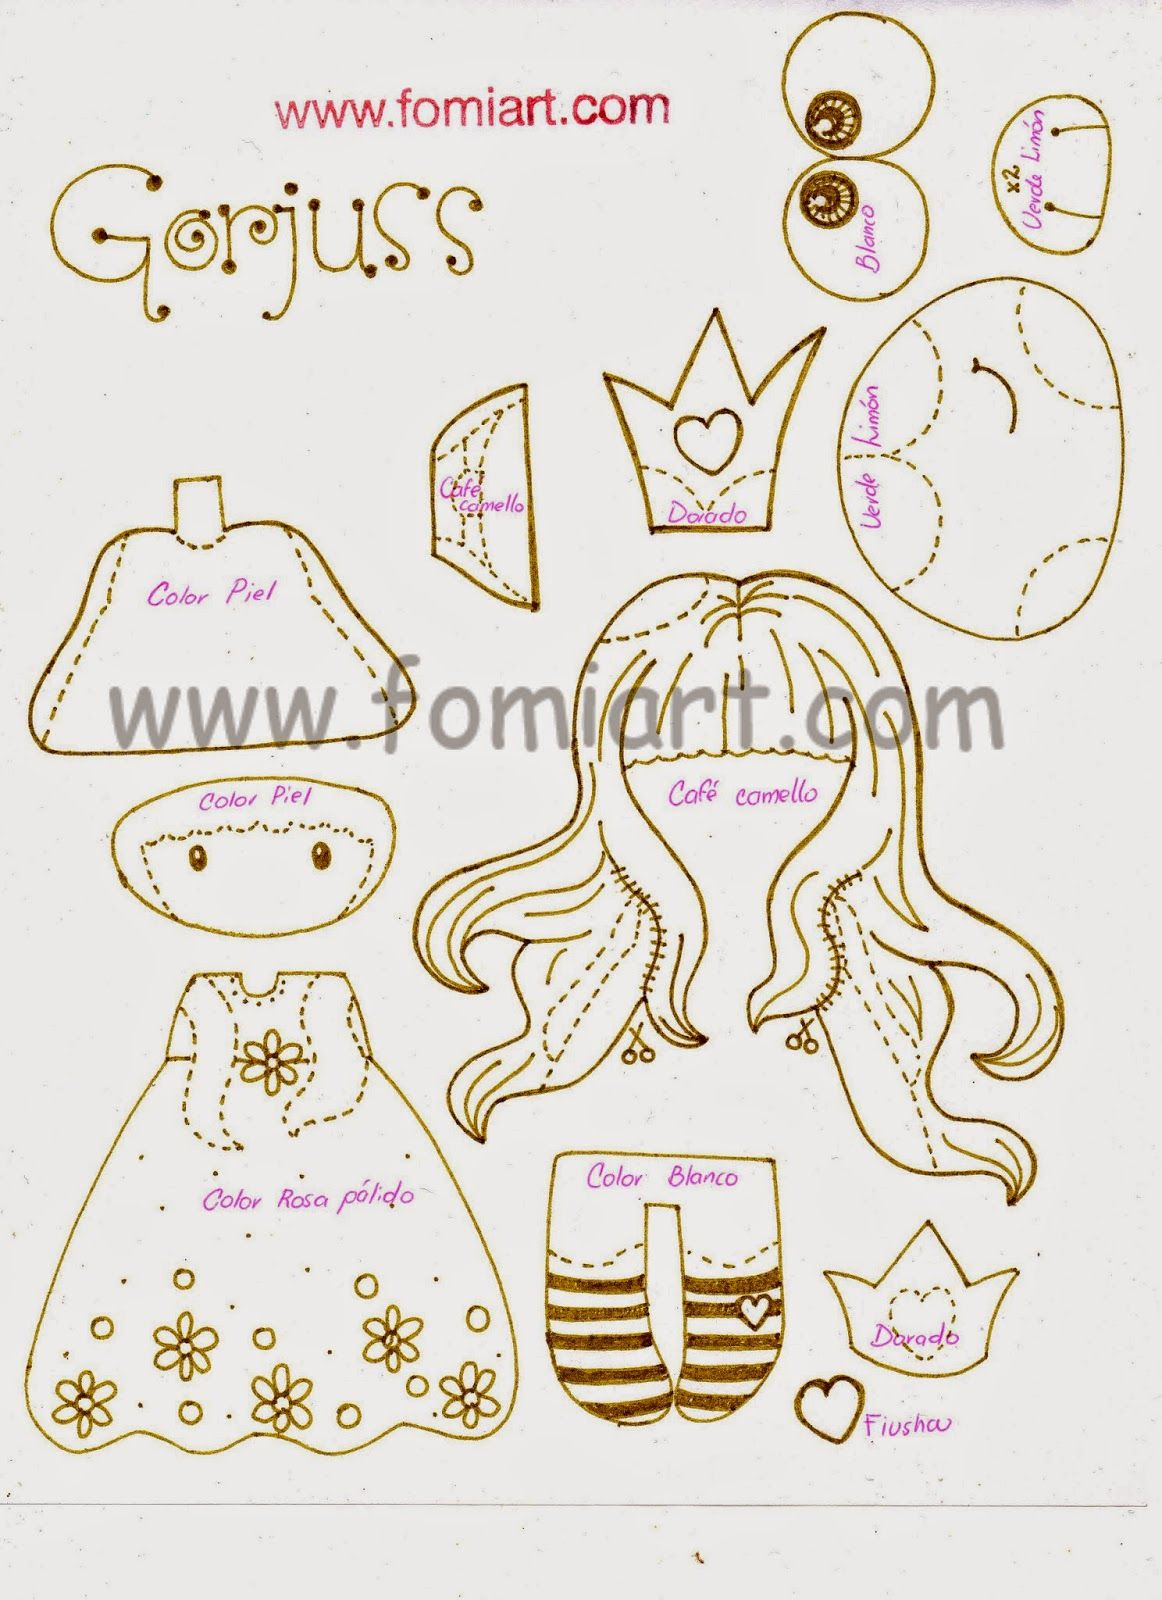 Patrones Gratis Princesa Gorjuss | Fomiart | Gorjuss | Pinterest ...